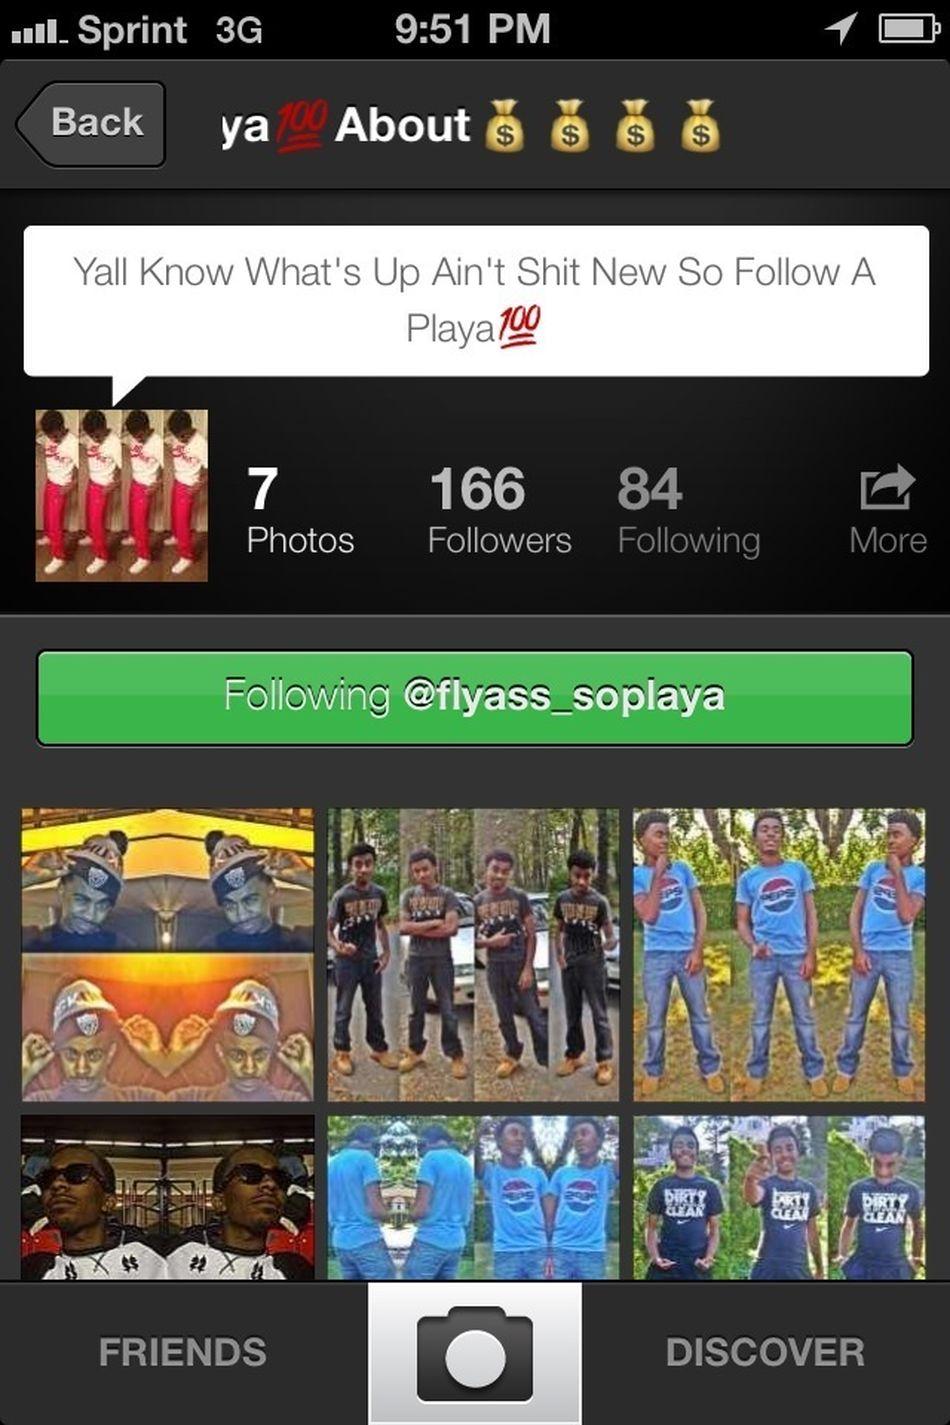 5/O To My Nigga @flyass_soplaya Yall Follow The Homie Like Now Bro Keep Shit Live And He Bool As Fu€K Yall Follow Bro Like Now